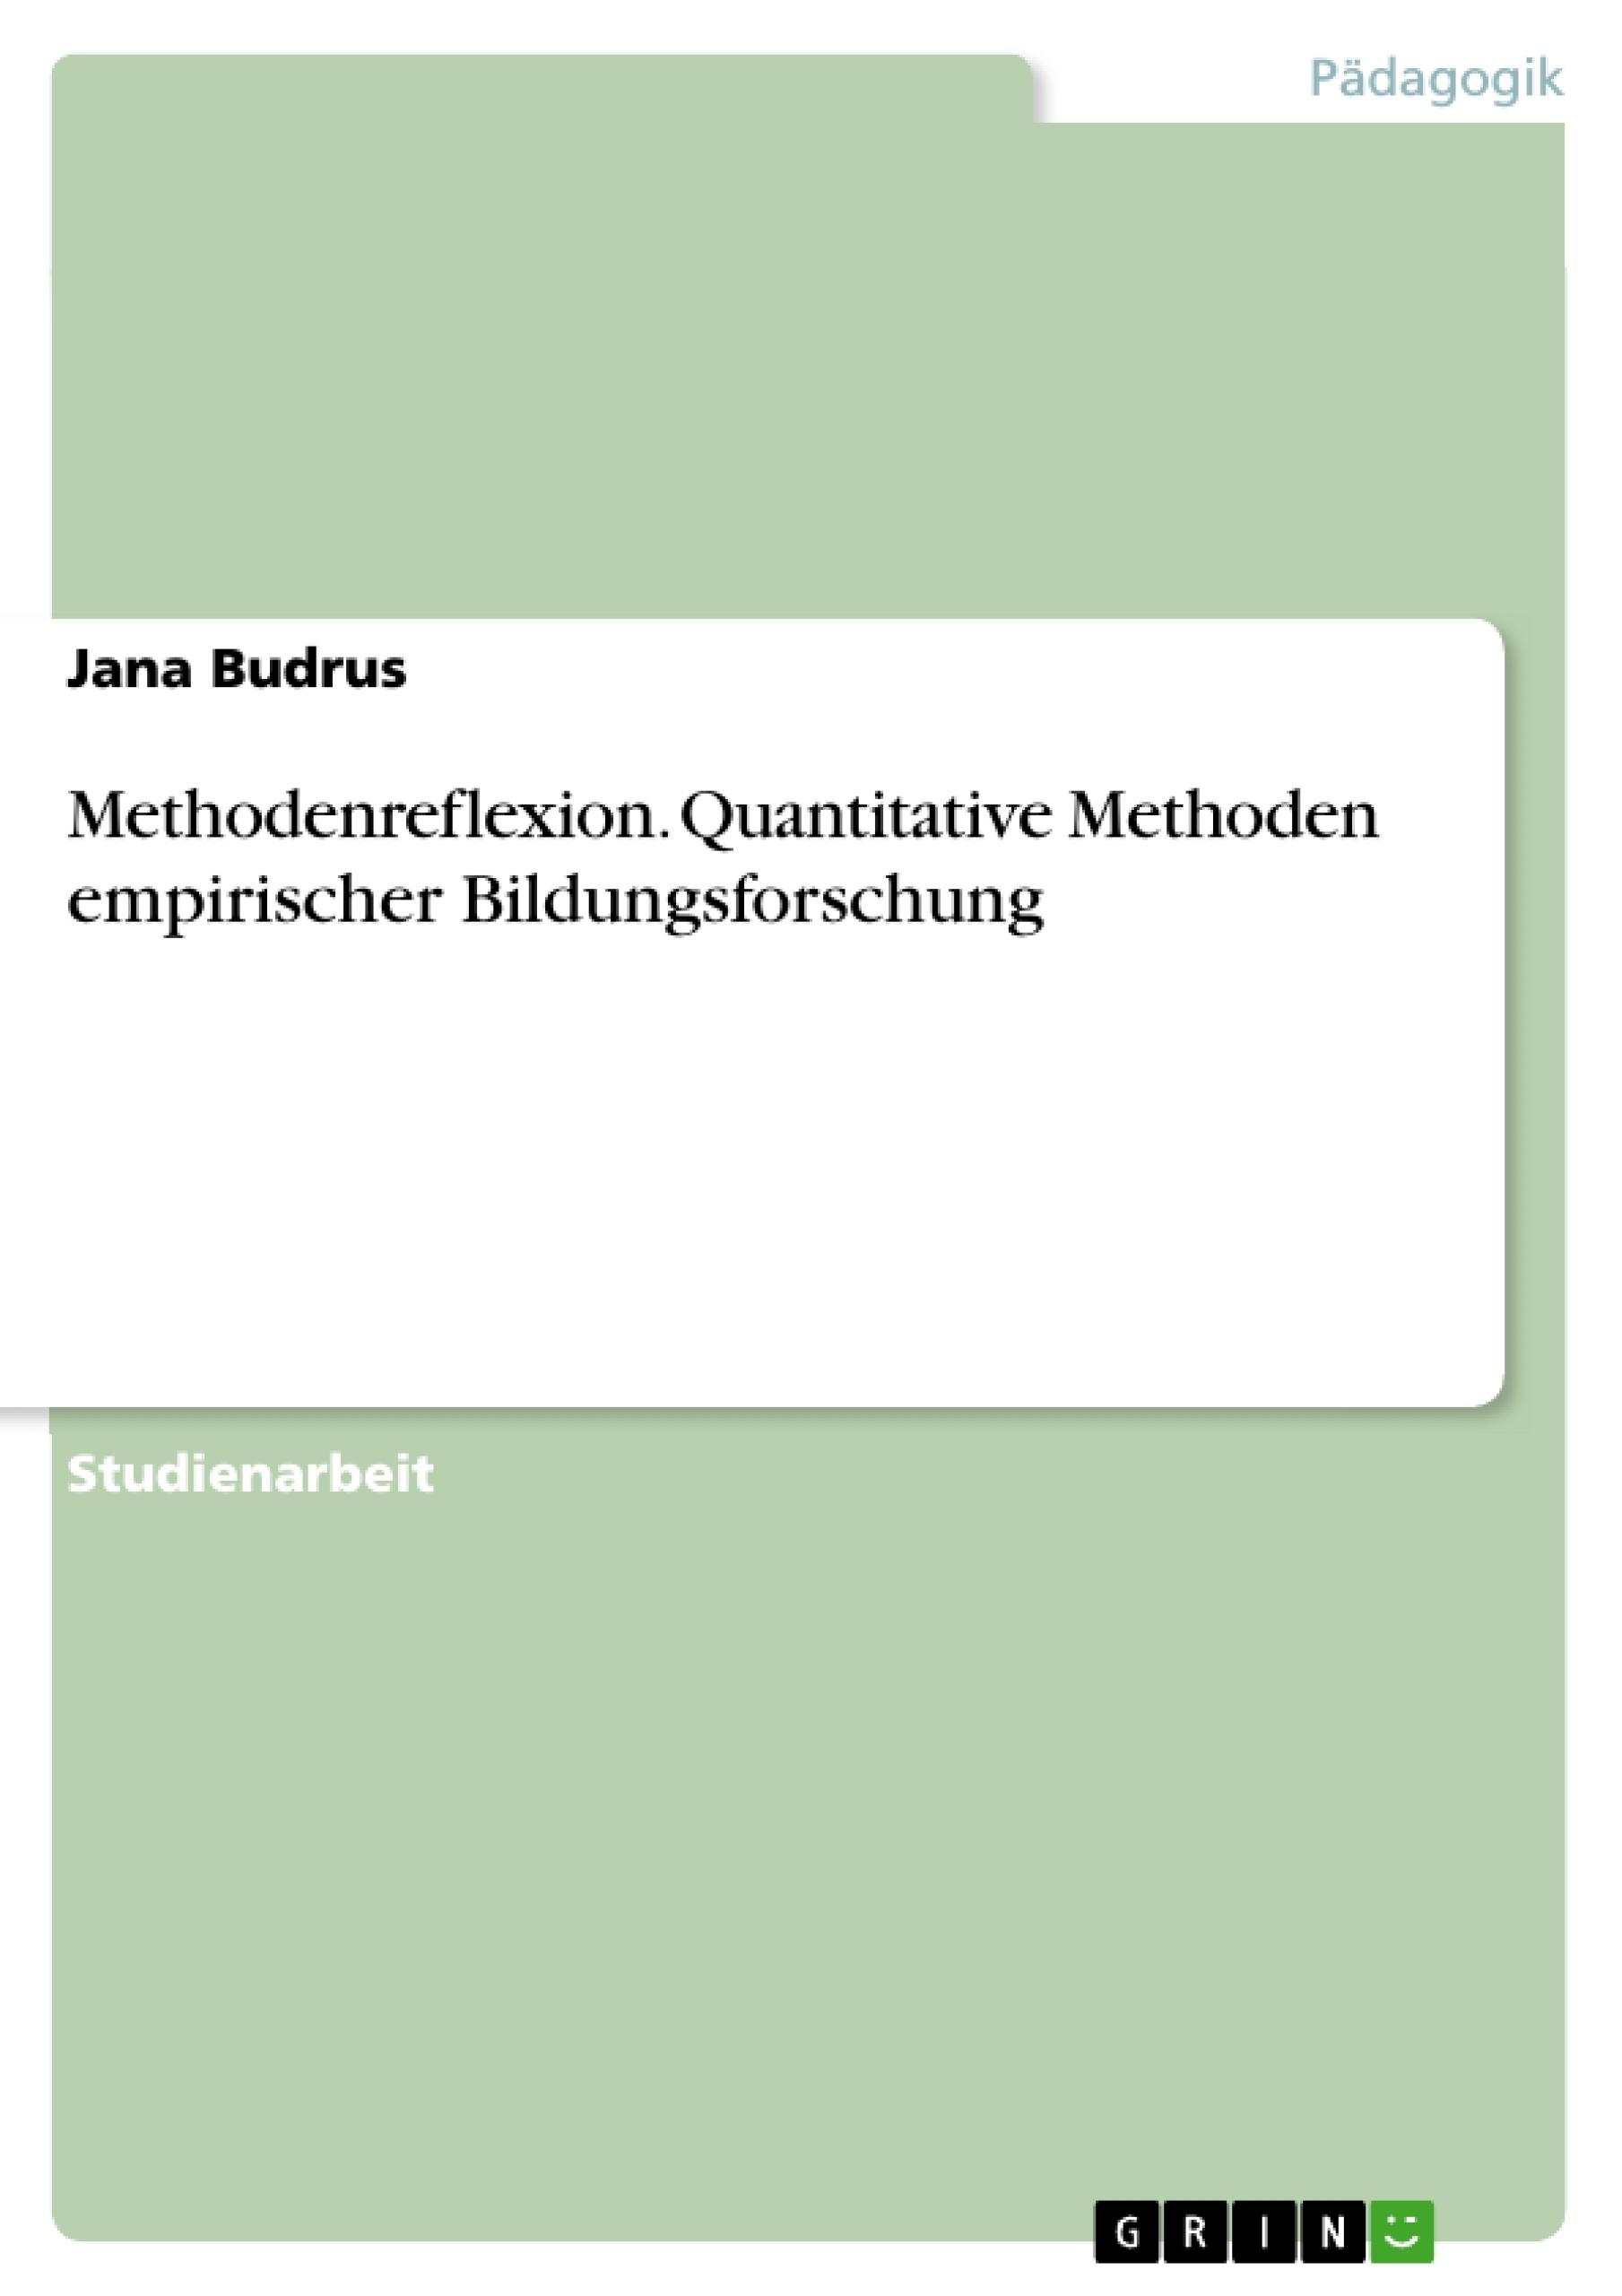 Titel: Methodenreflexion. Quantitative Methoden empirischer Bildungsforschung